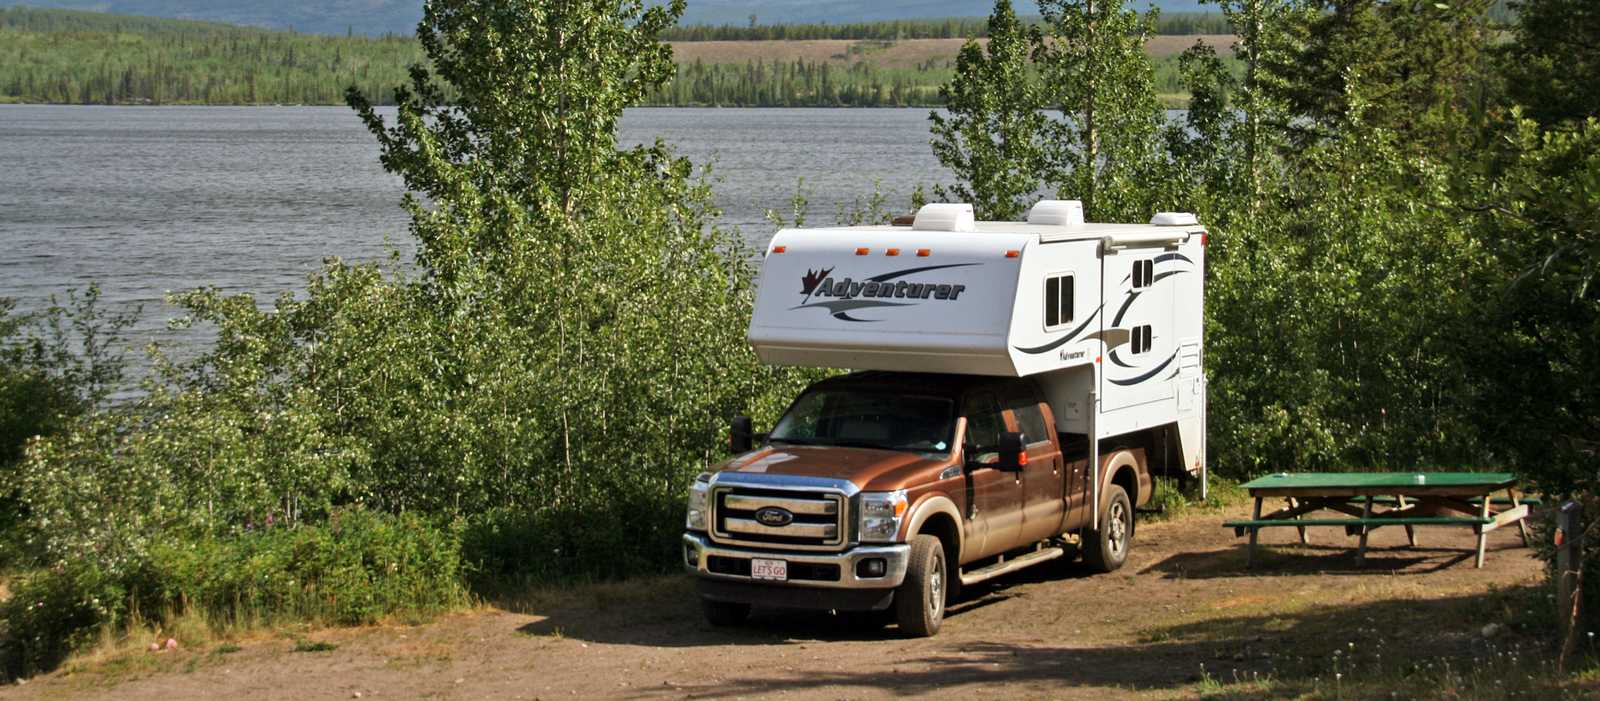 Tarfu Lake Campground/Yukon